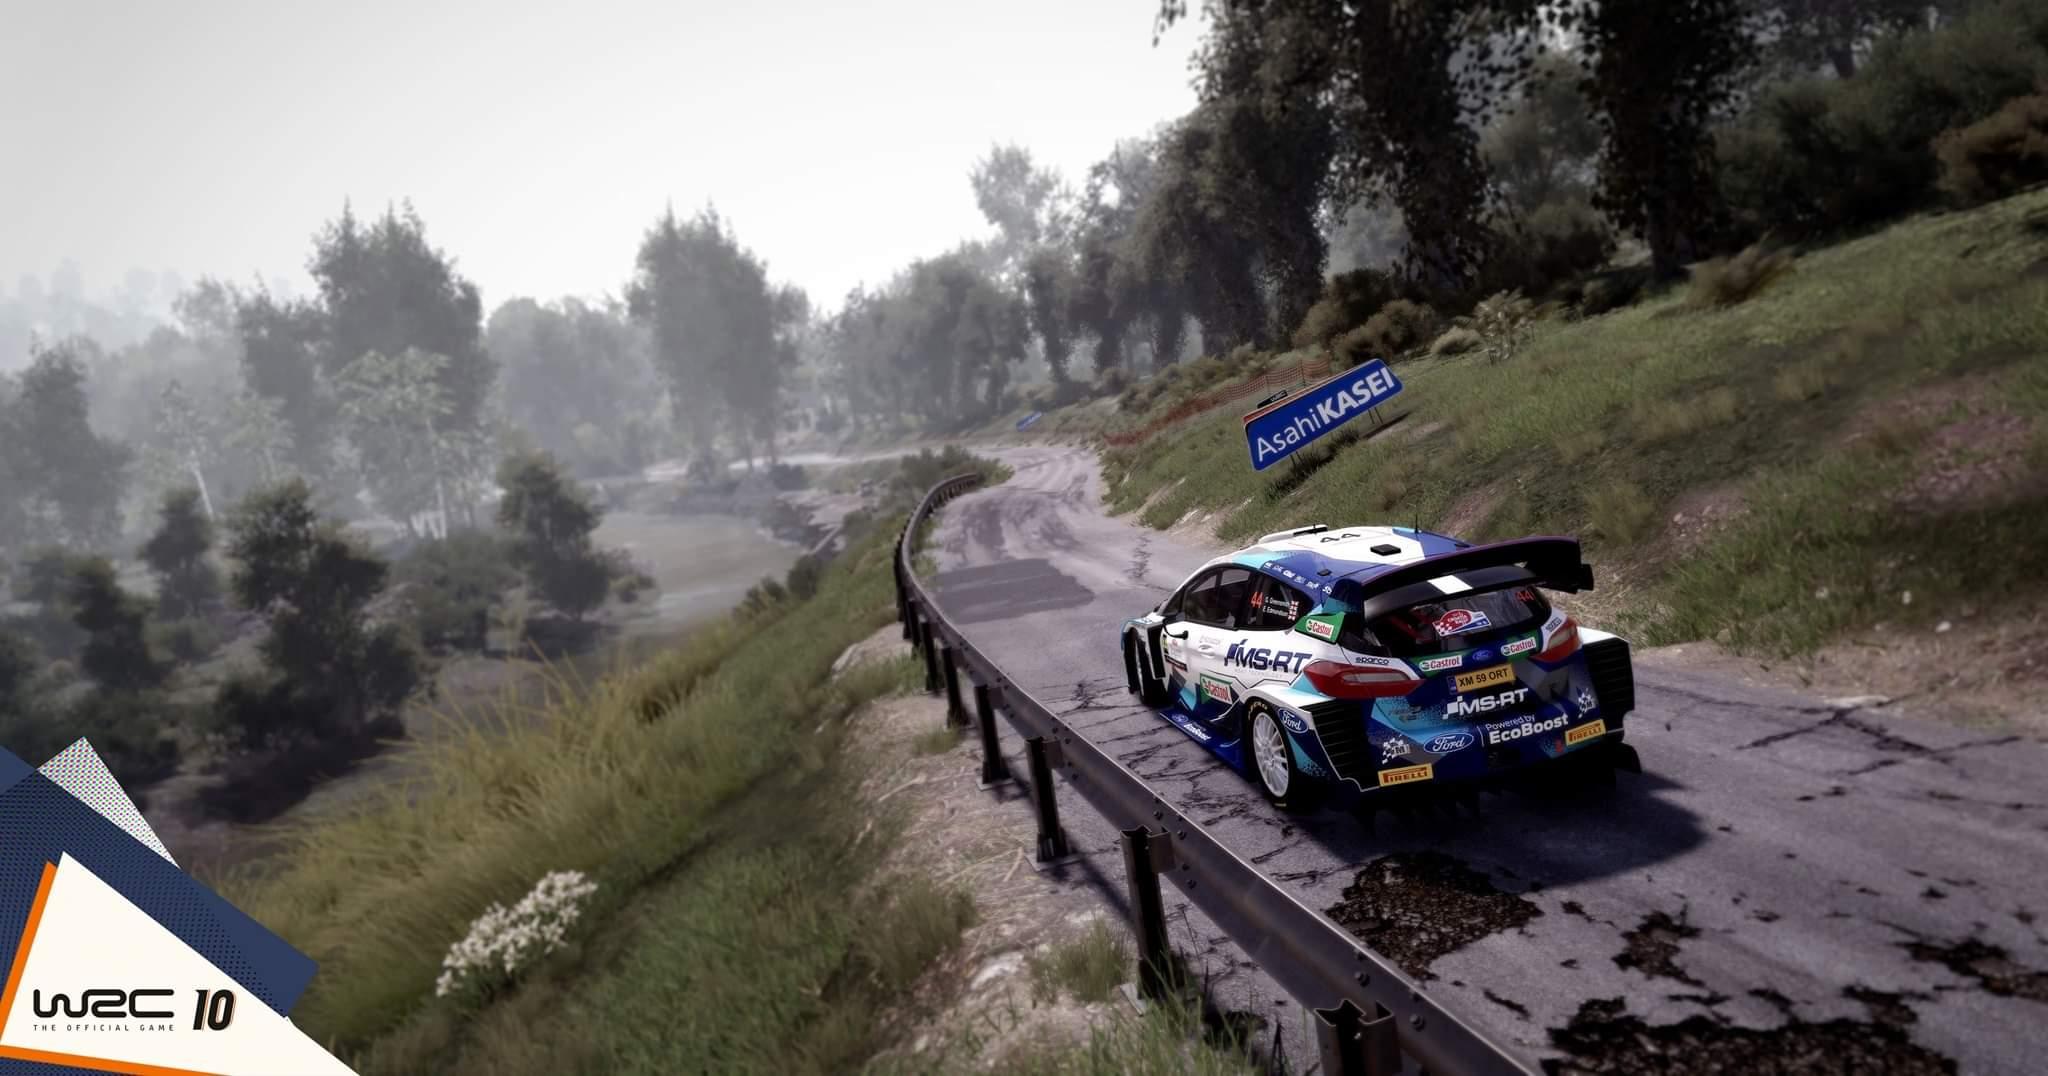 WRC 10 - Физика автомобилей будет доработана